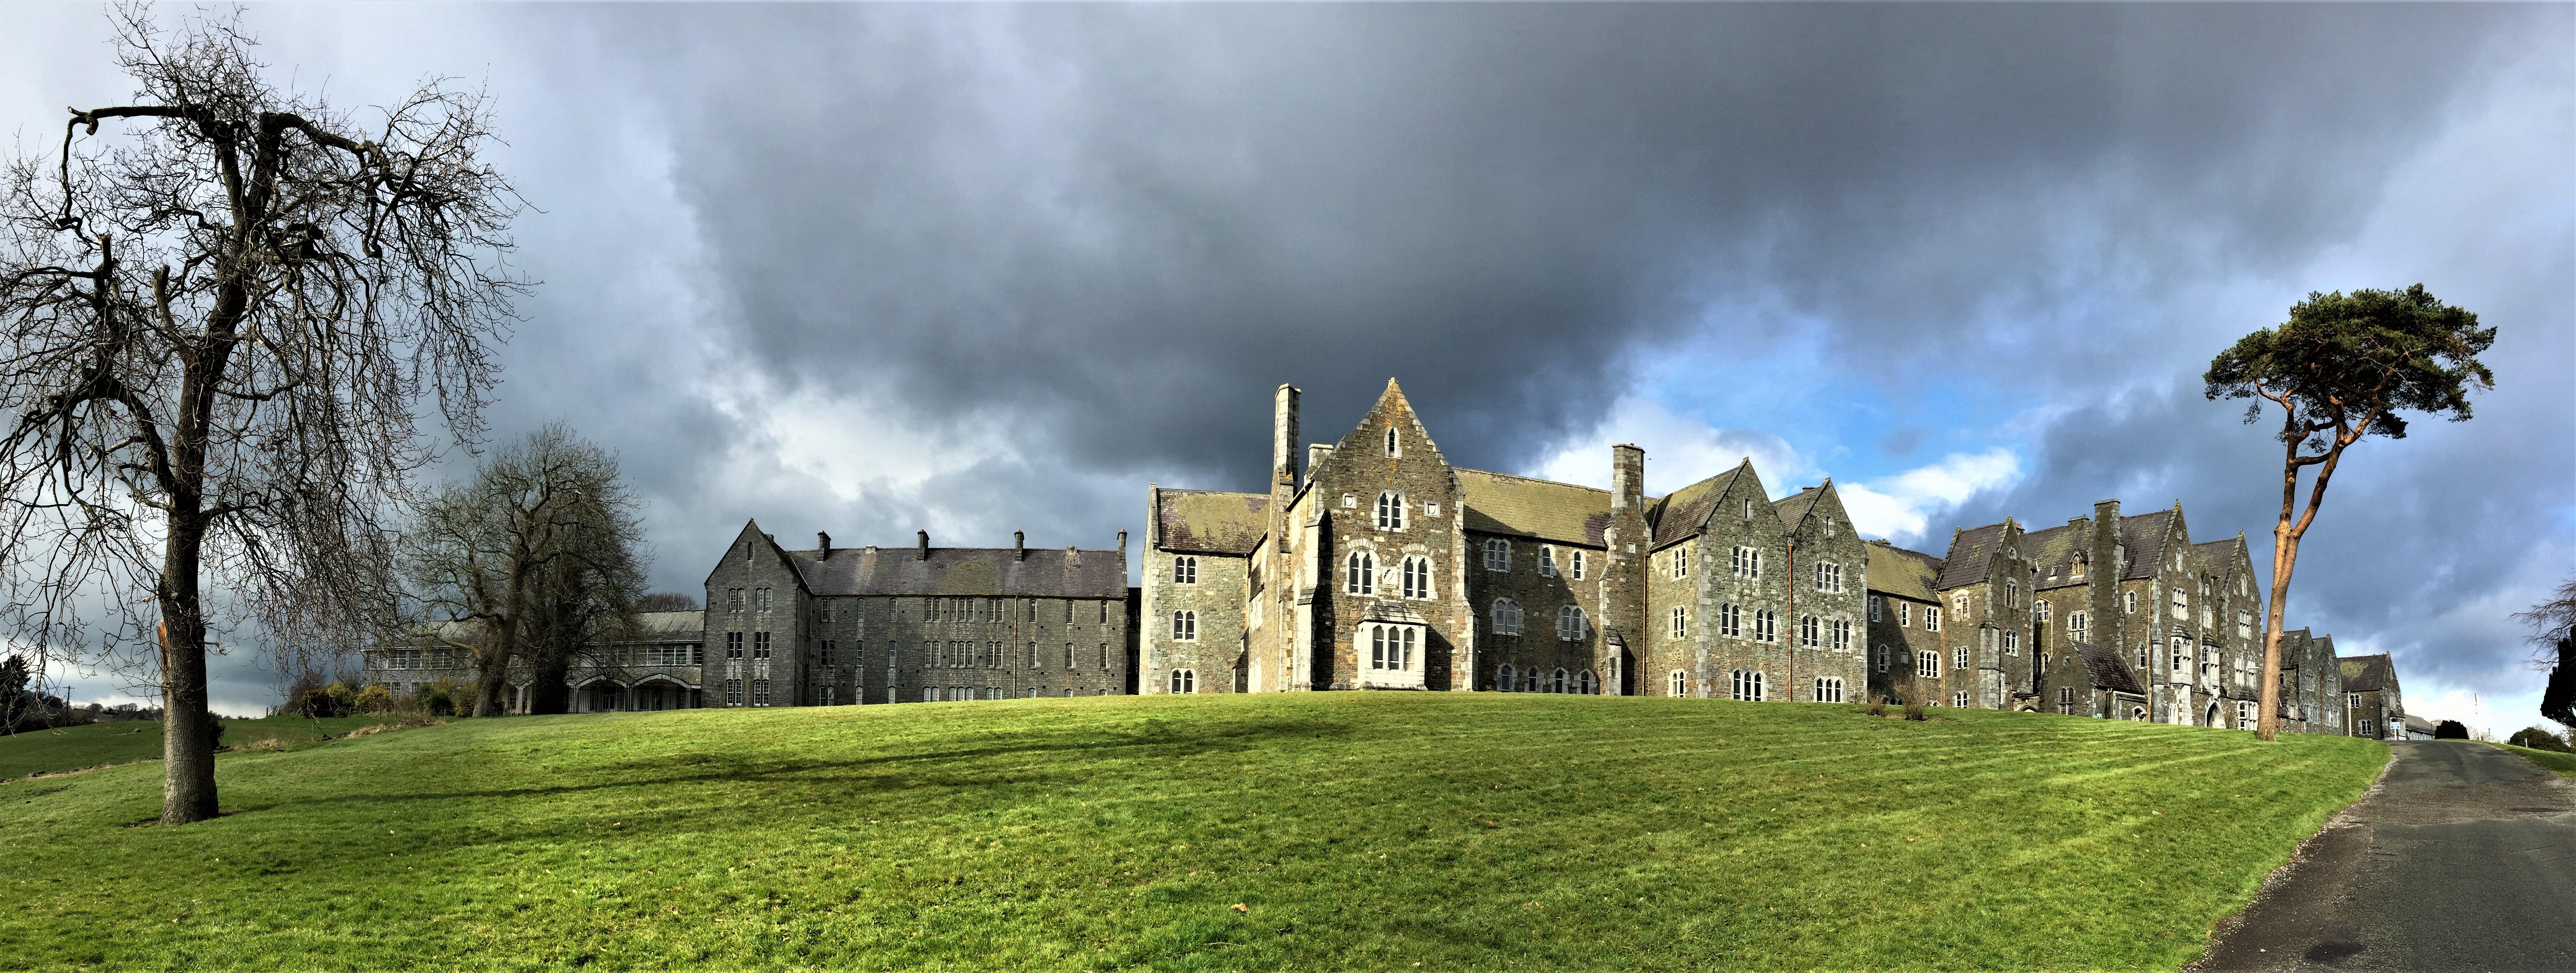 1-St Finan's Hospital, Killarney